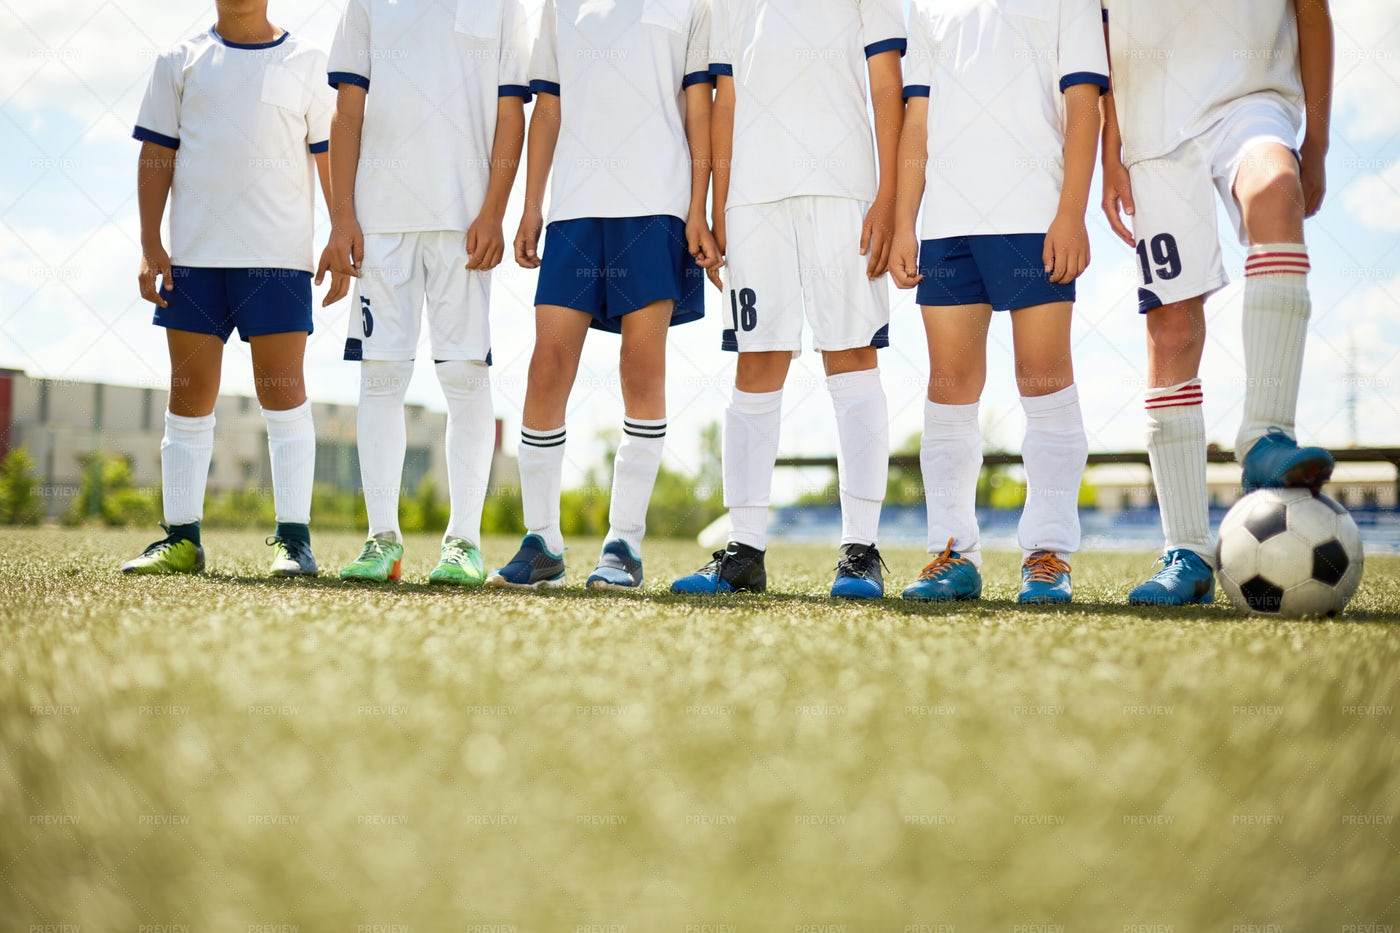 Unrecognizable Football Team In...: Stock Photos